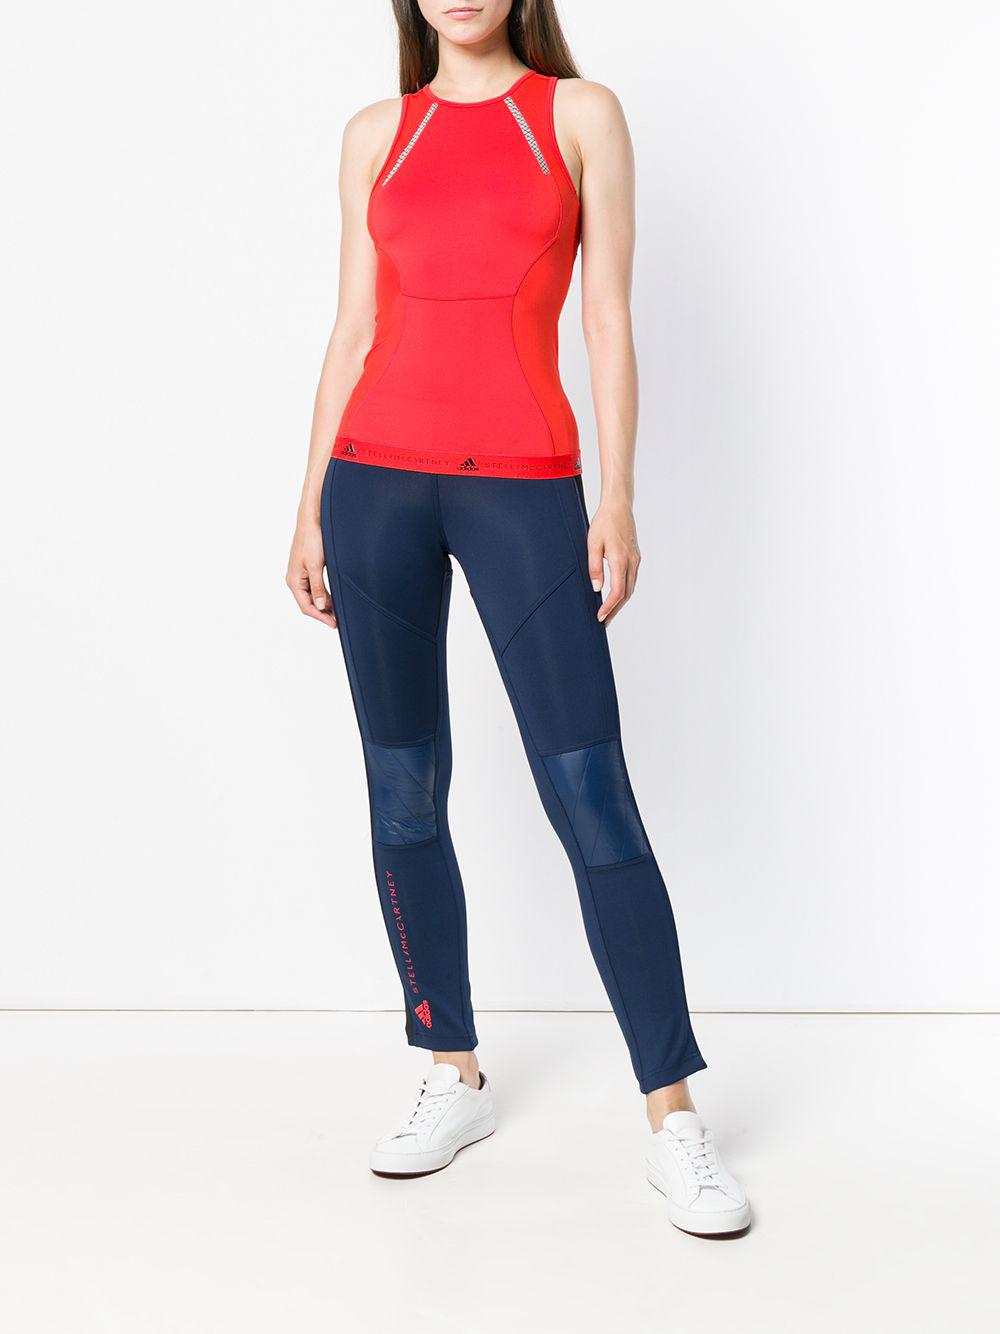 84b069b61feb Adidas By Stella McCartney - Red Fitted Running Tank Top - Lyst. View  fullscreen